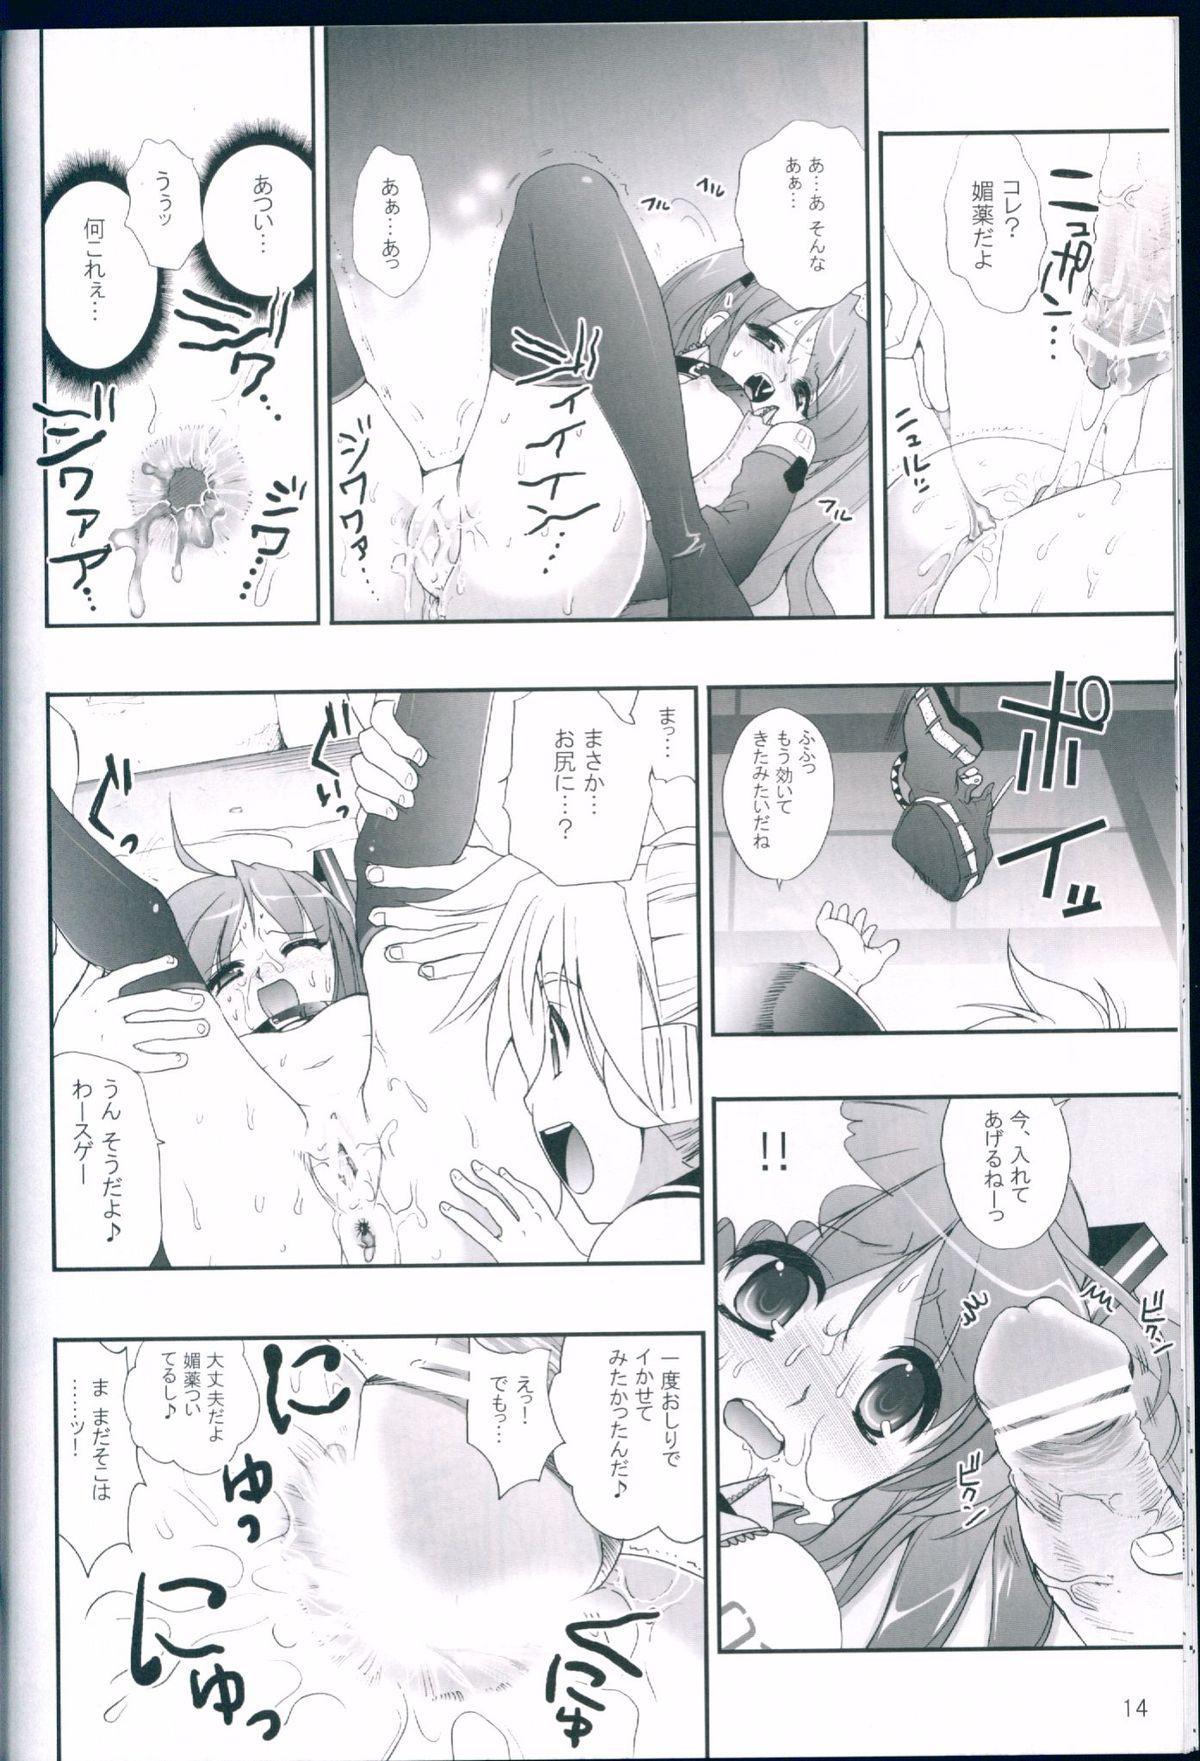 R Juu - Hatsune Miku Kenkan 13